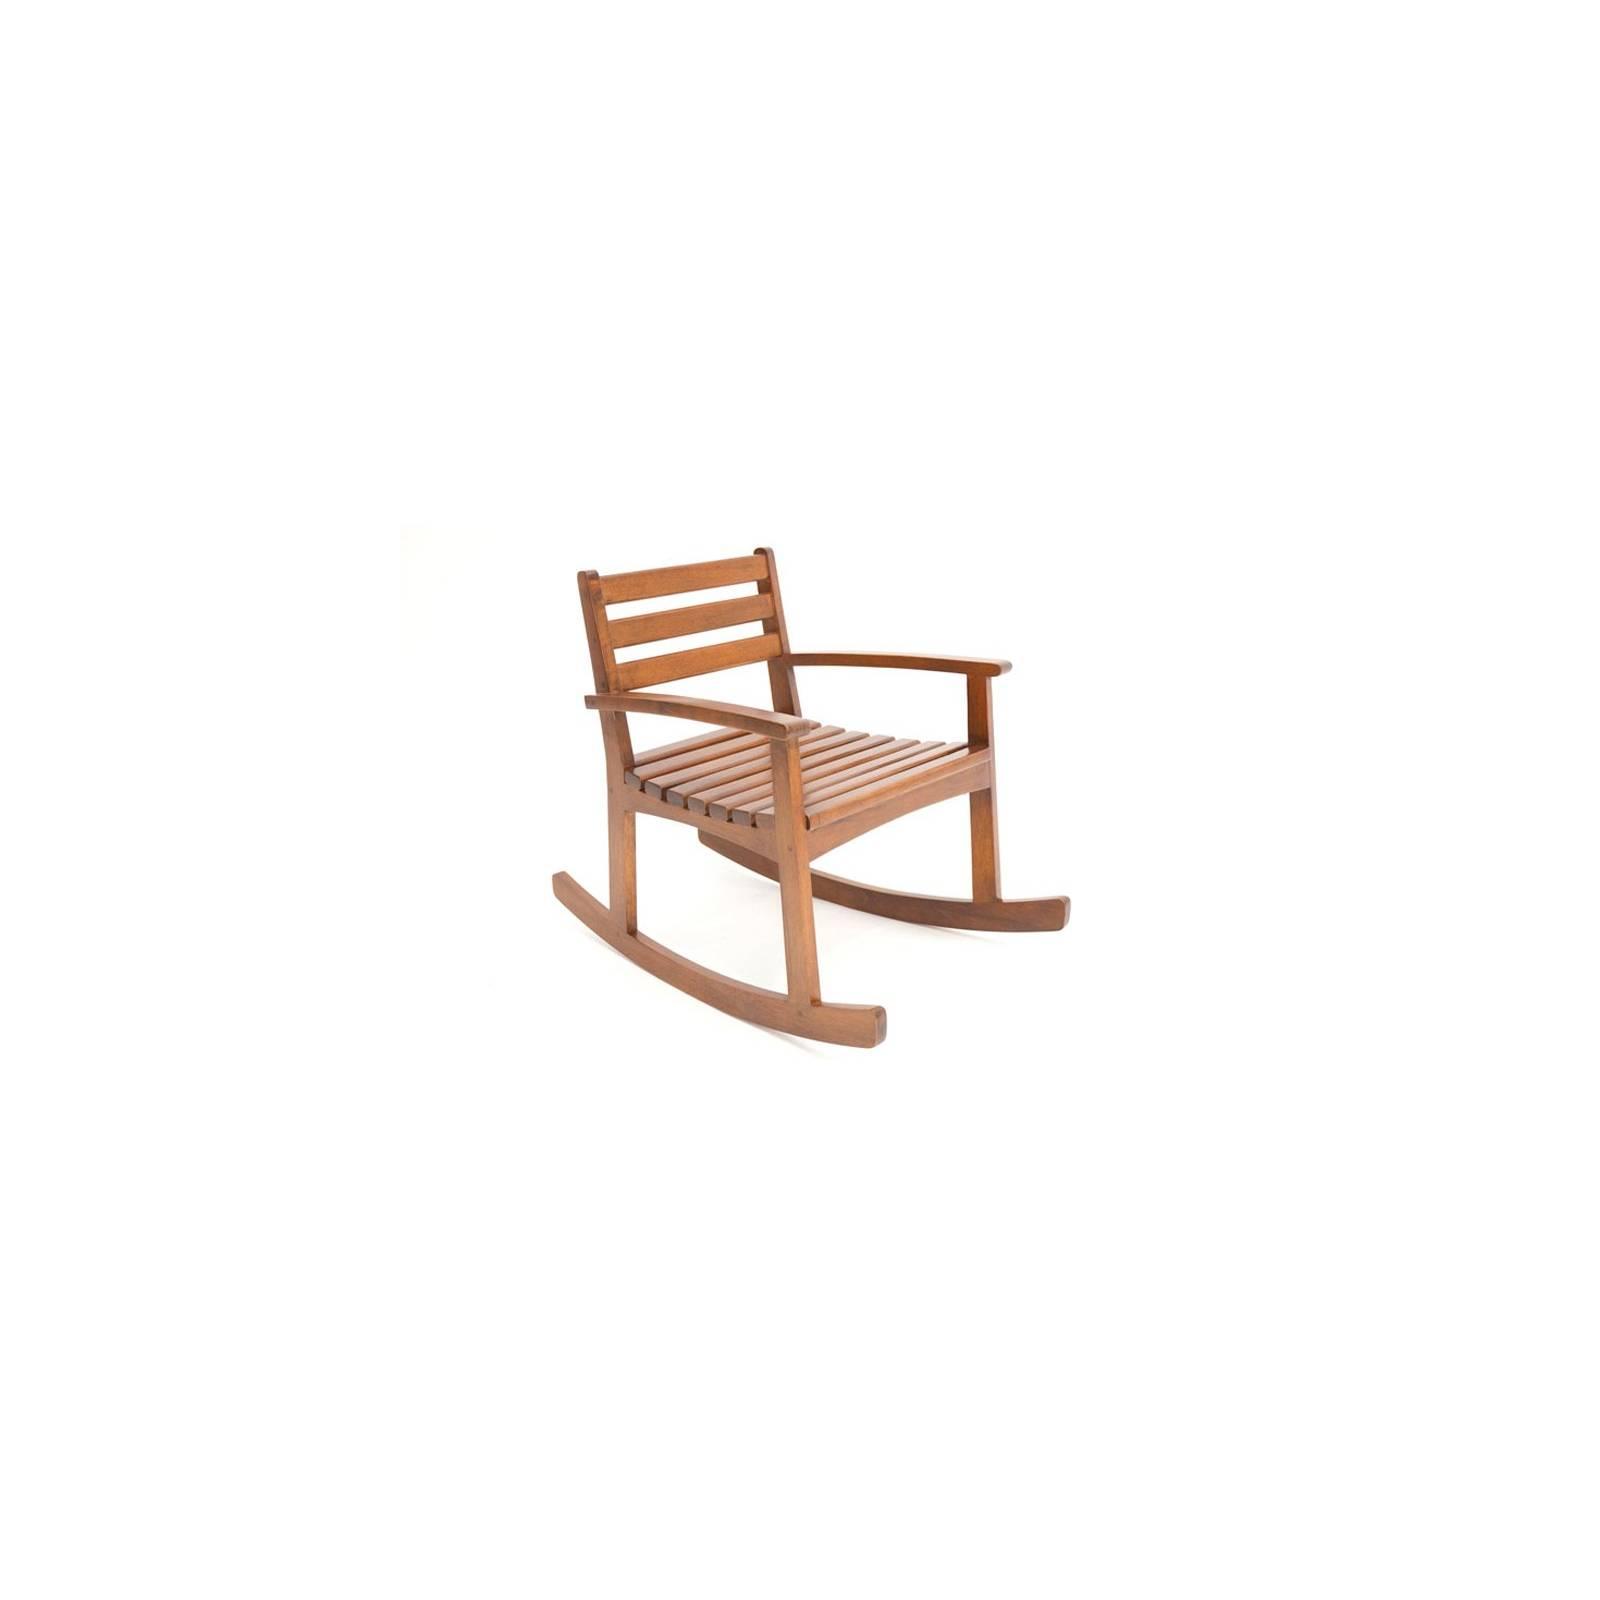 Rocking Chair Tradition Hévéa - meuble style classique